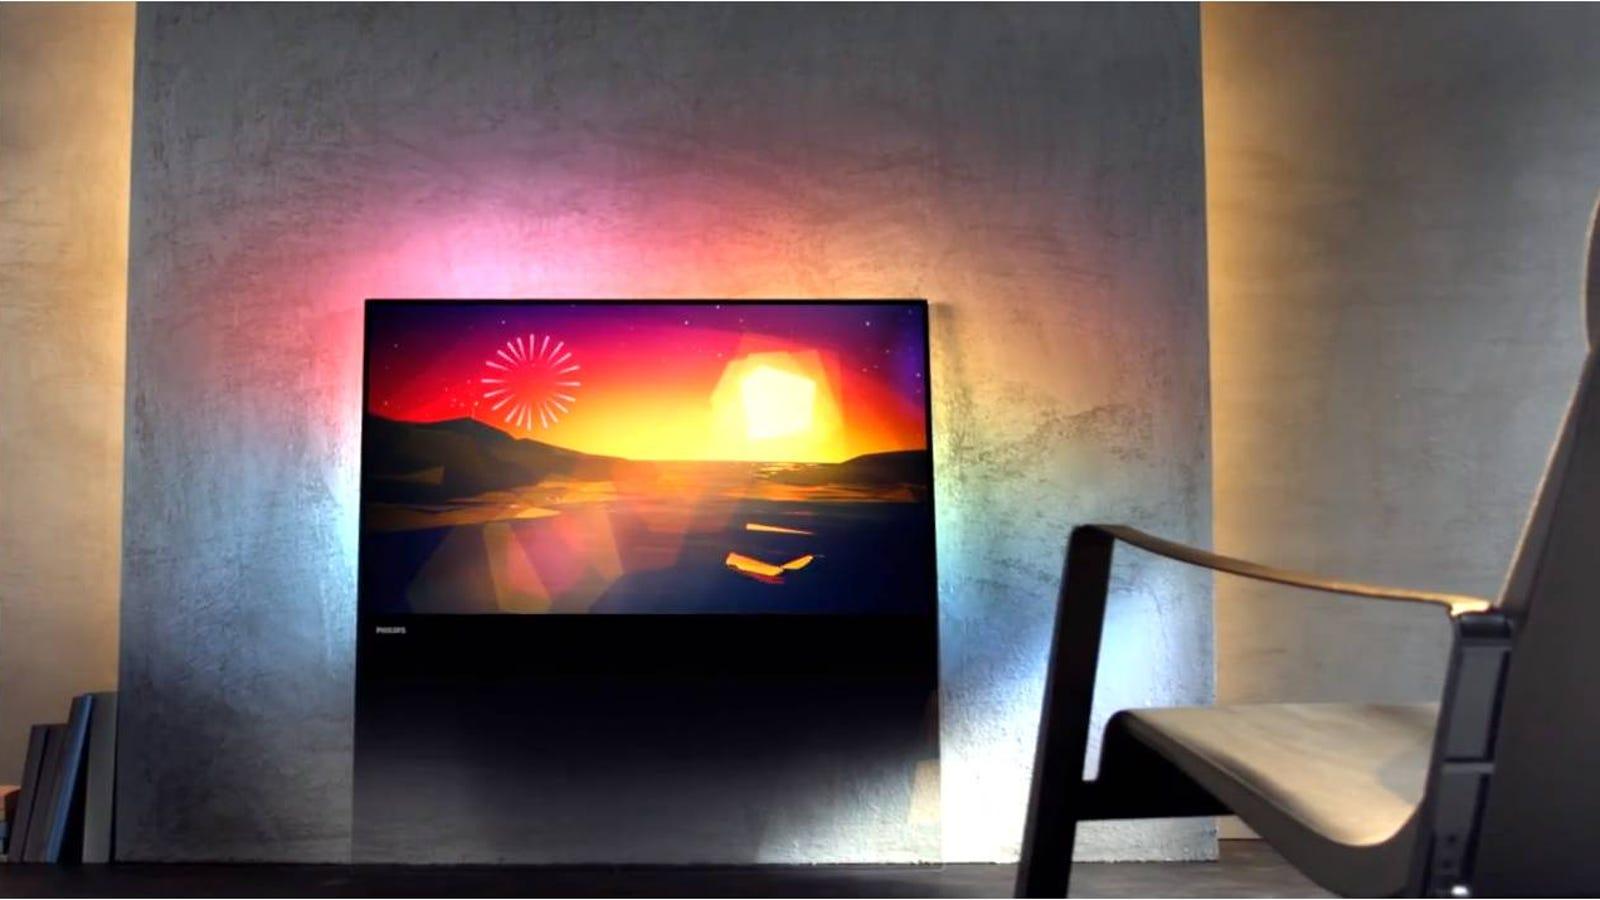 El televisor del futuro? Una lámina de cristal apoyada en la pared